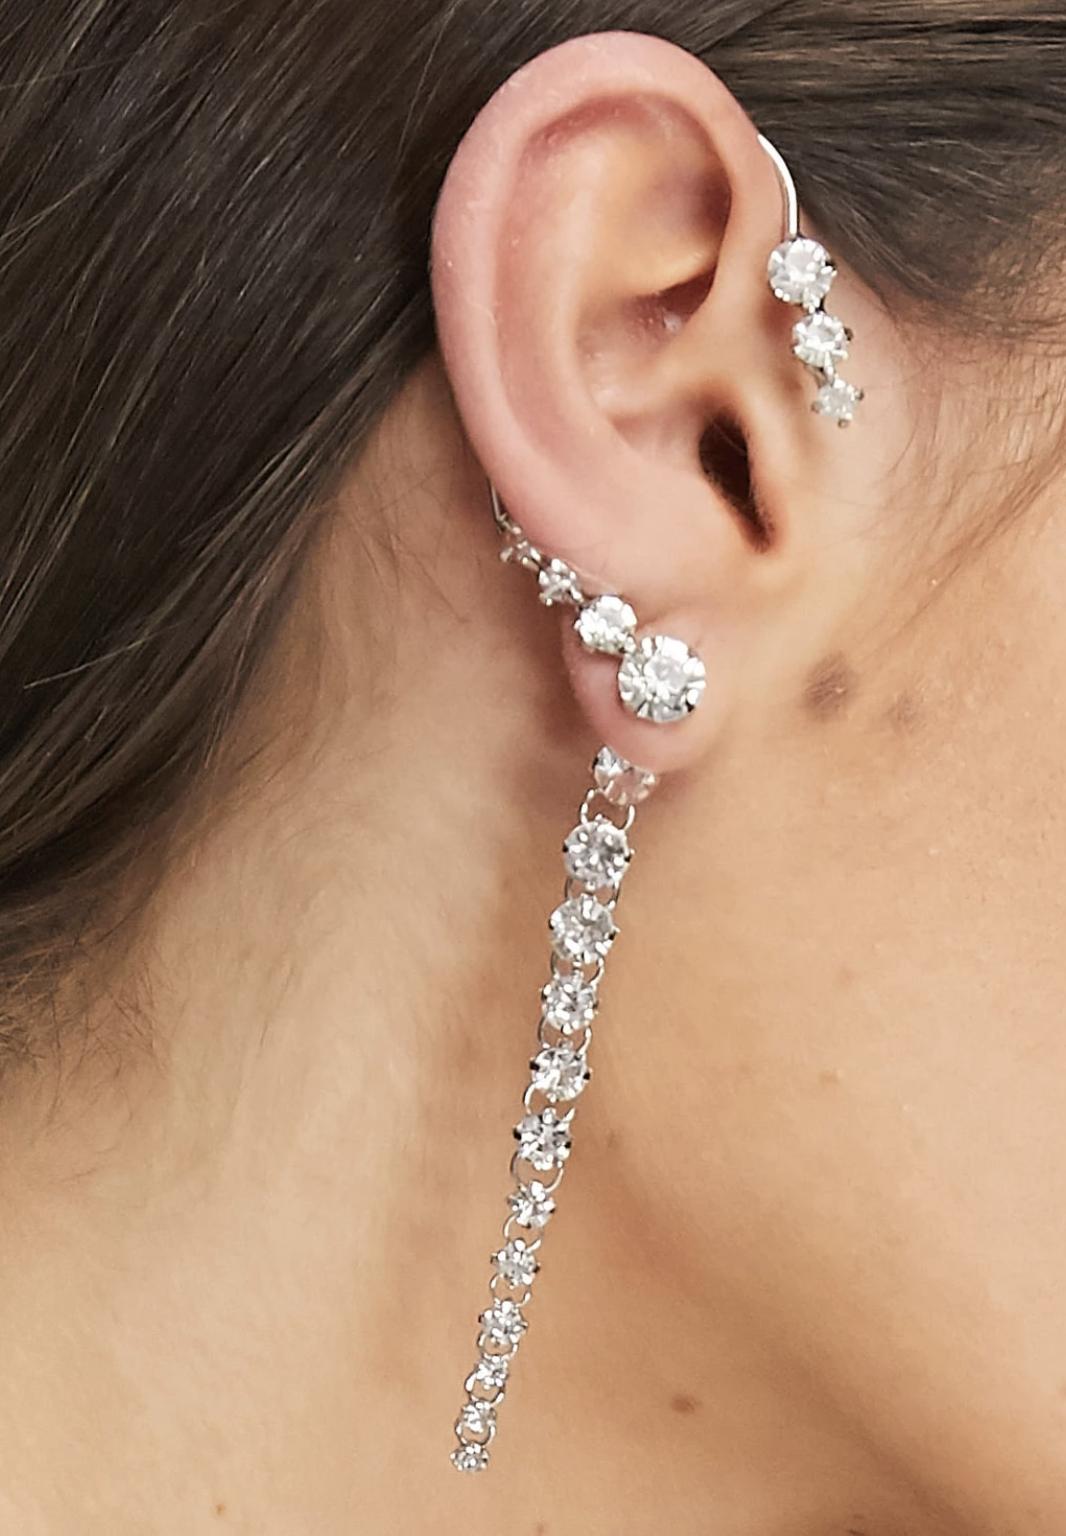 Ear cuff plateado con diamantes de imitación exclusivo de DesignB London